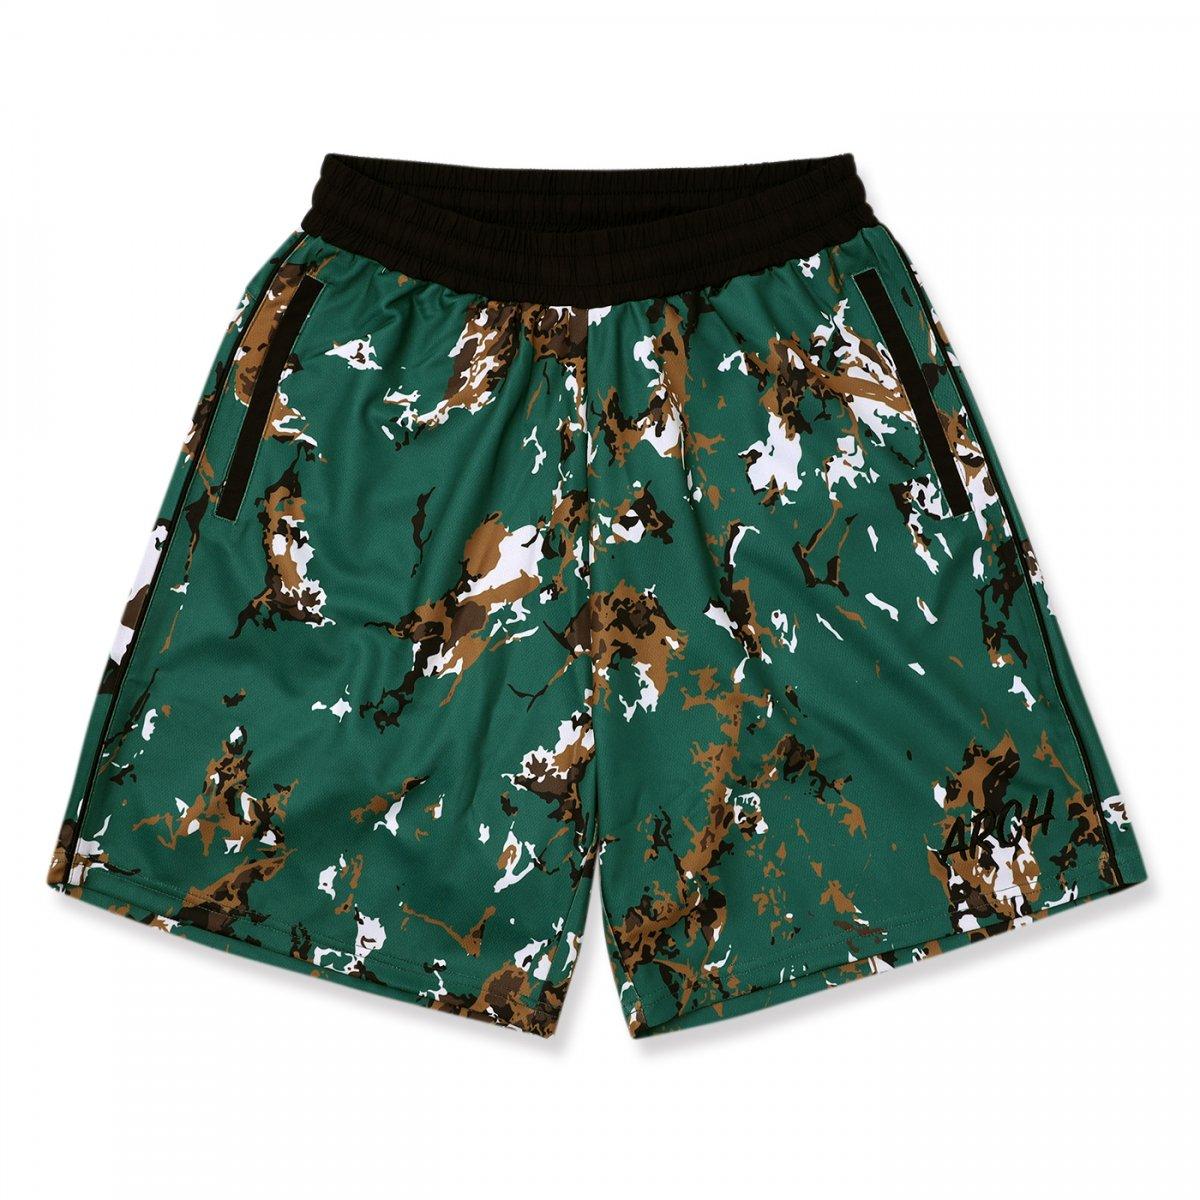 marbling shorts 【green】